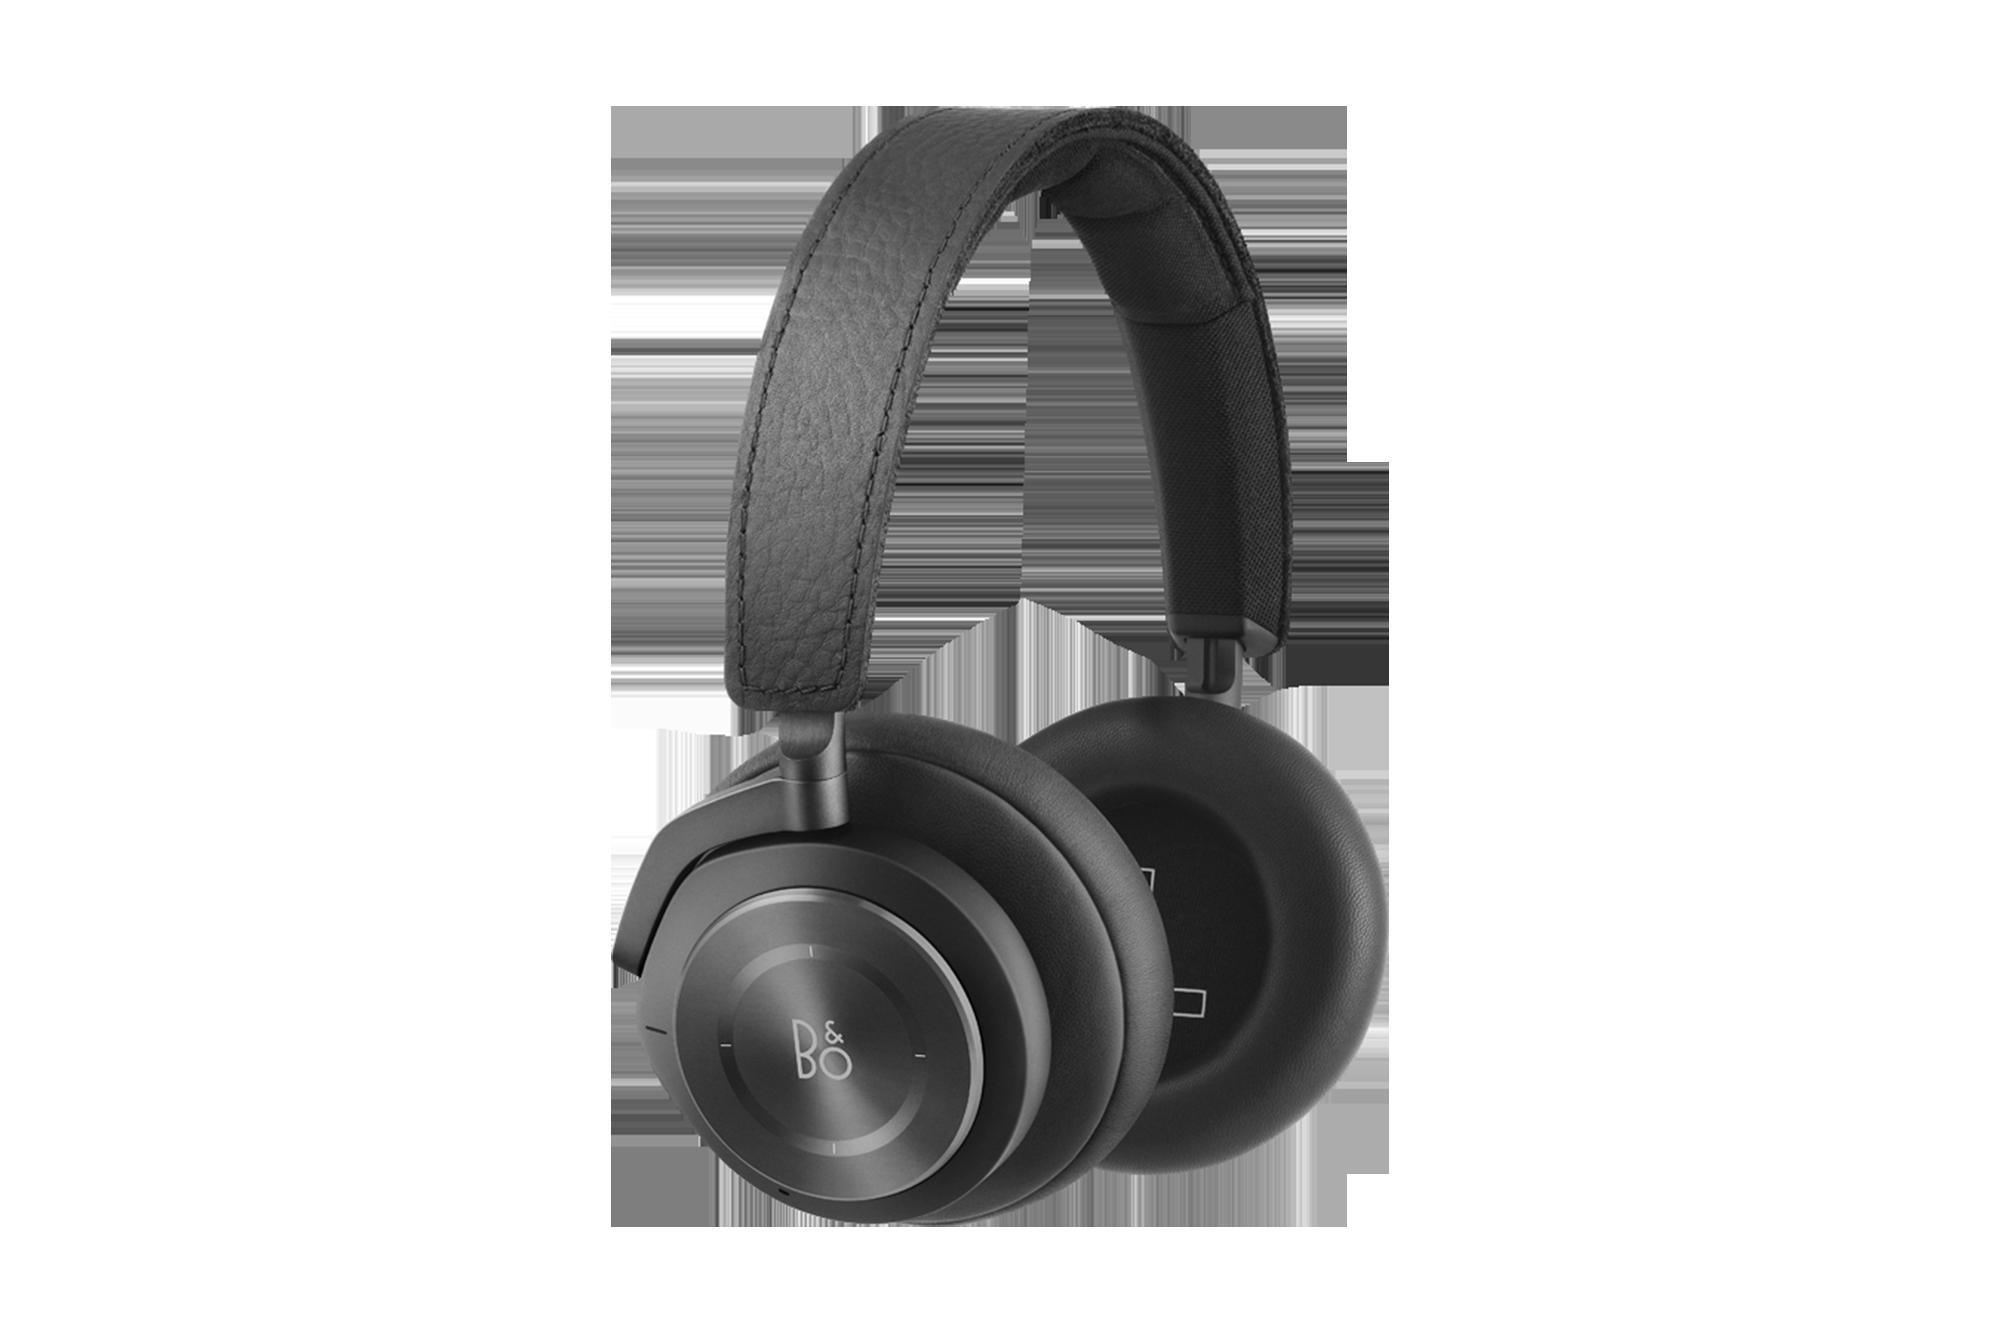 B&O BLUETOOTH HEADPHONES H9i BLACK